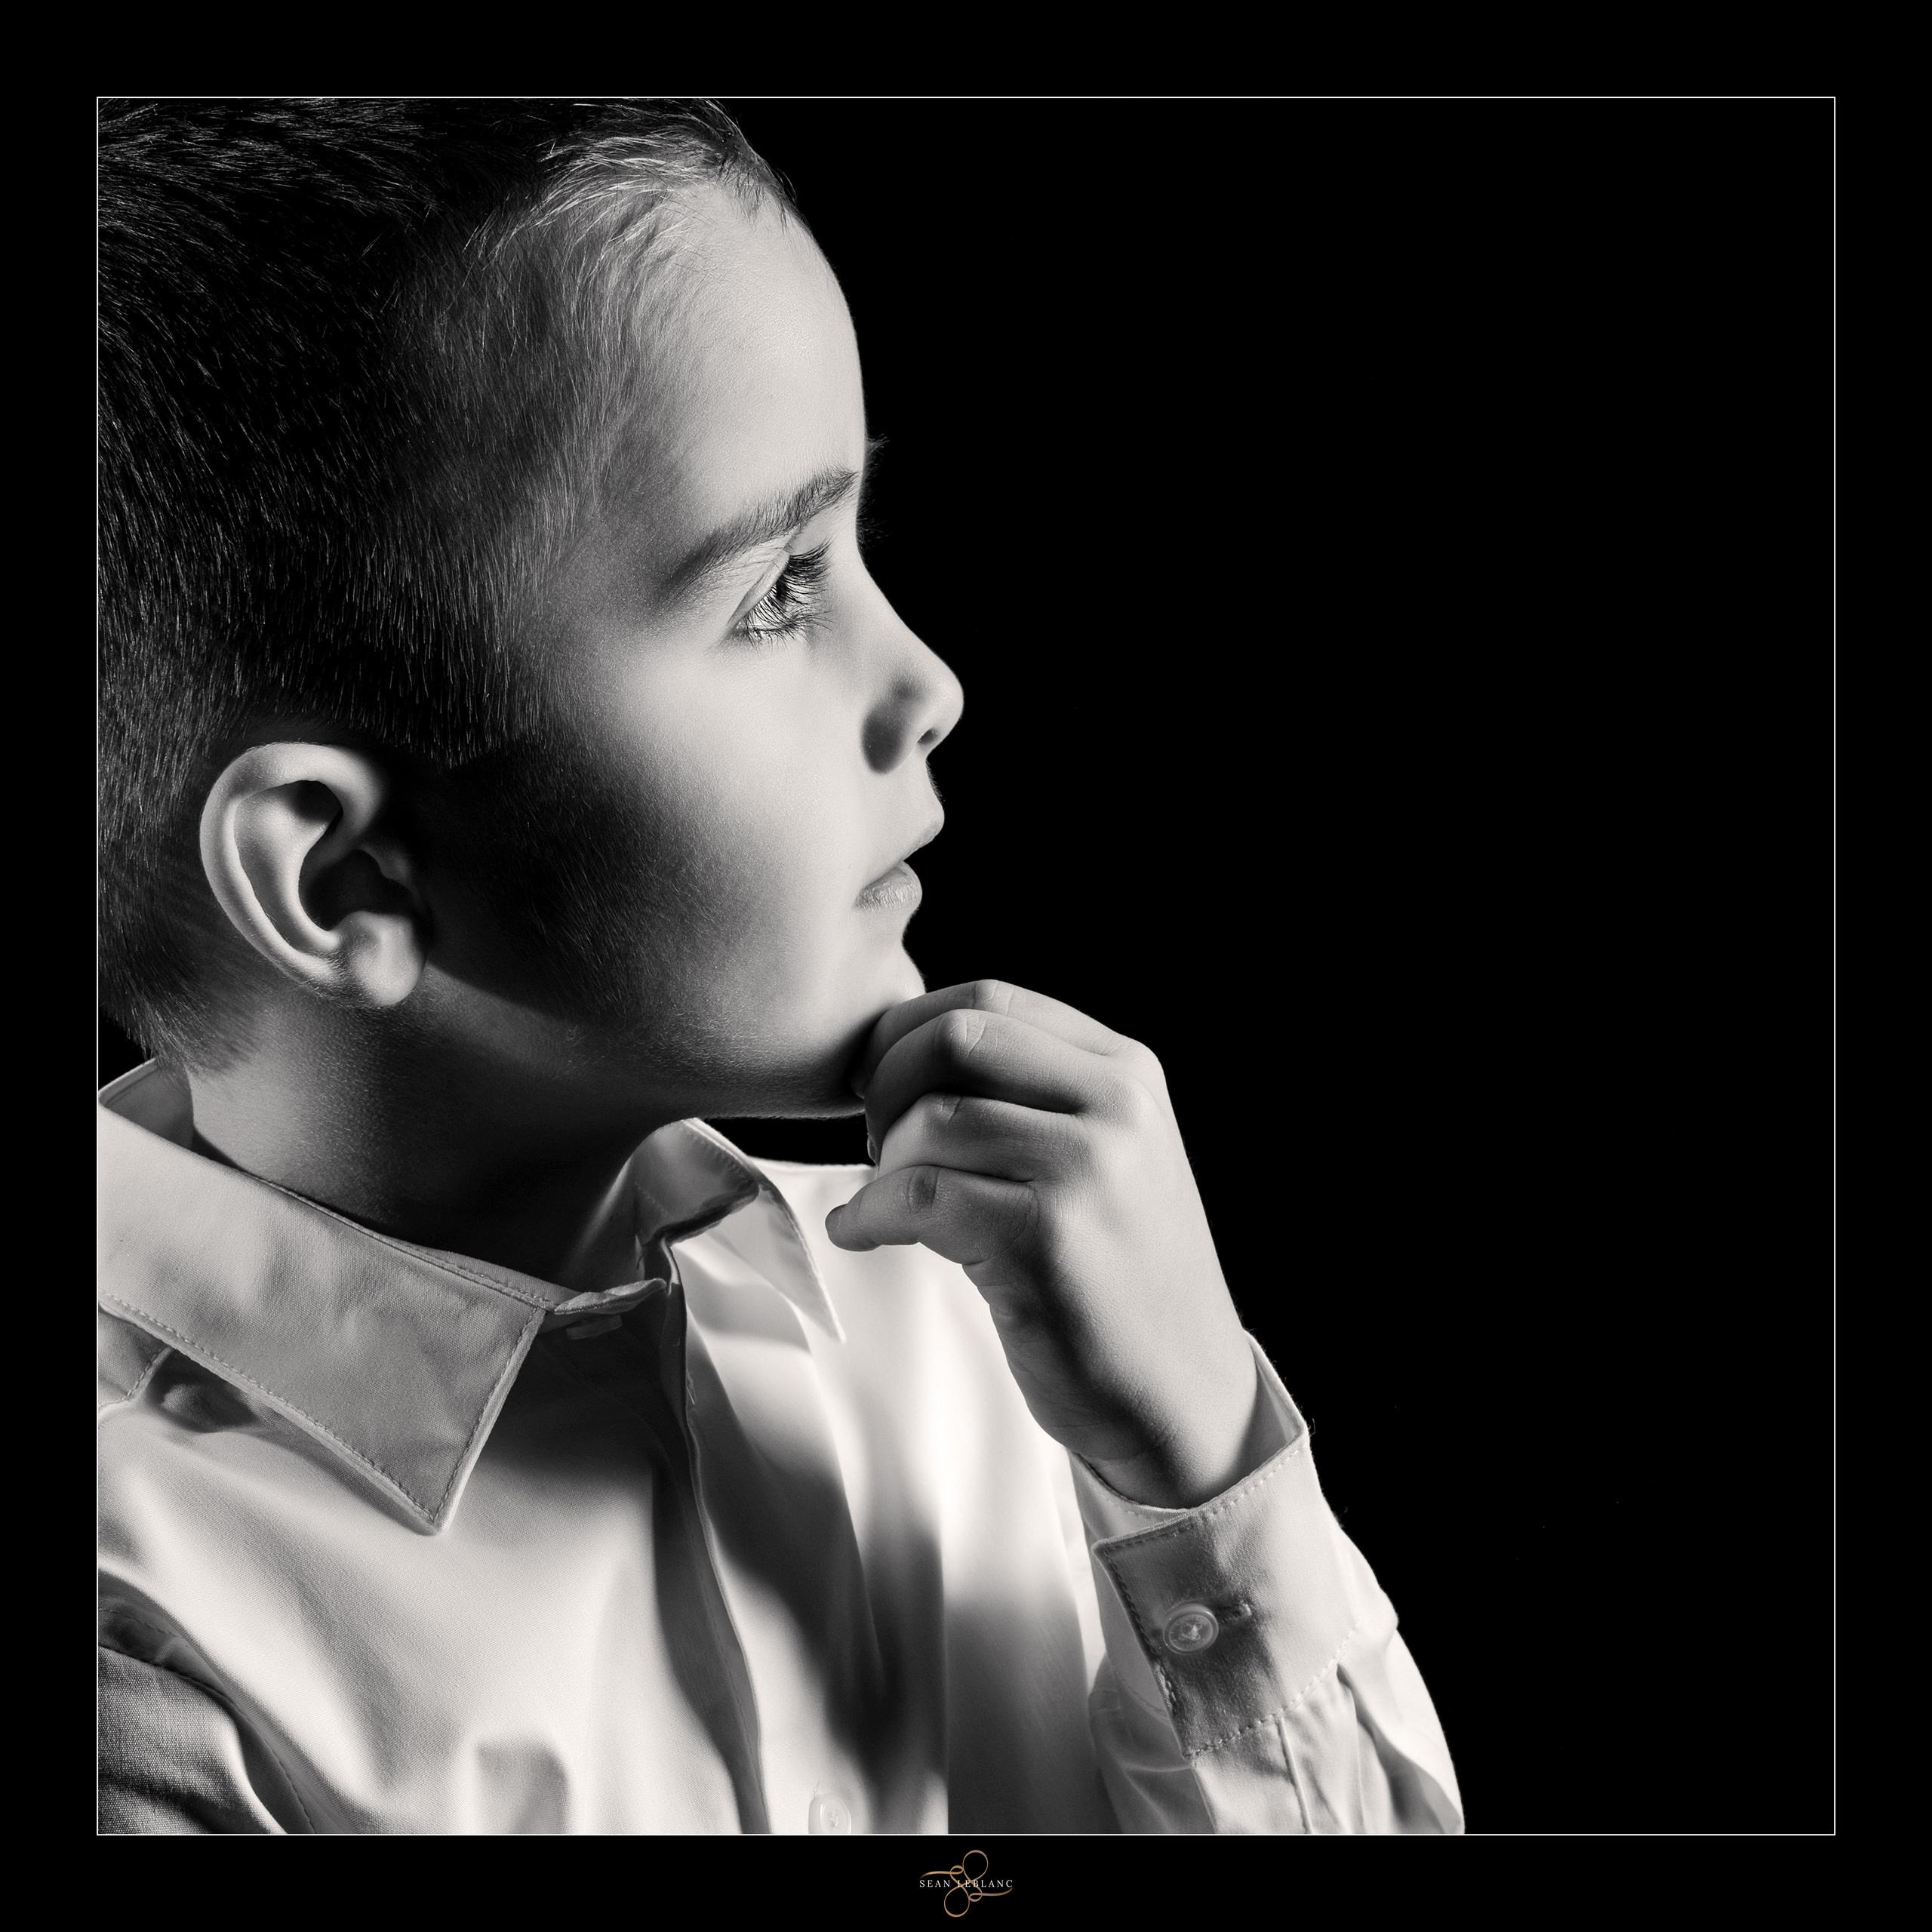 fine art portraiture by award winning photographer Sean LeBlanc